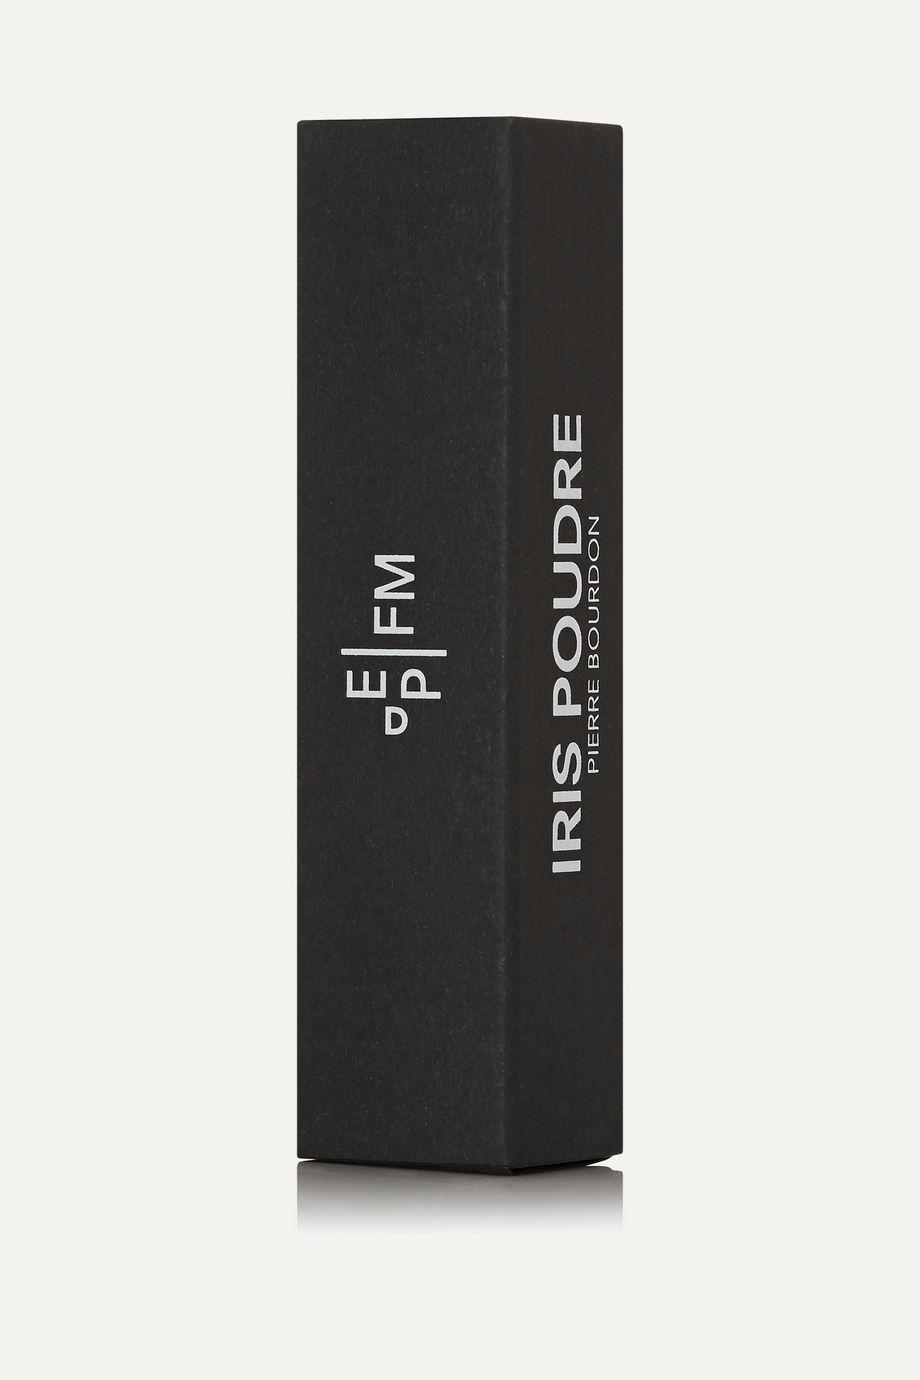 Frederic Malle Iris Poudre Eau de Parfum - Iris & Sandalwood, 10ml